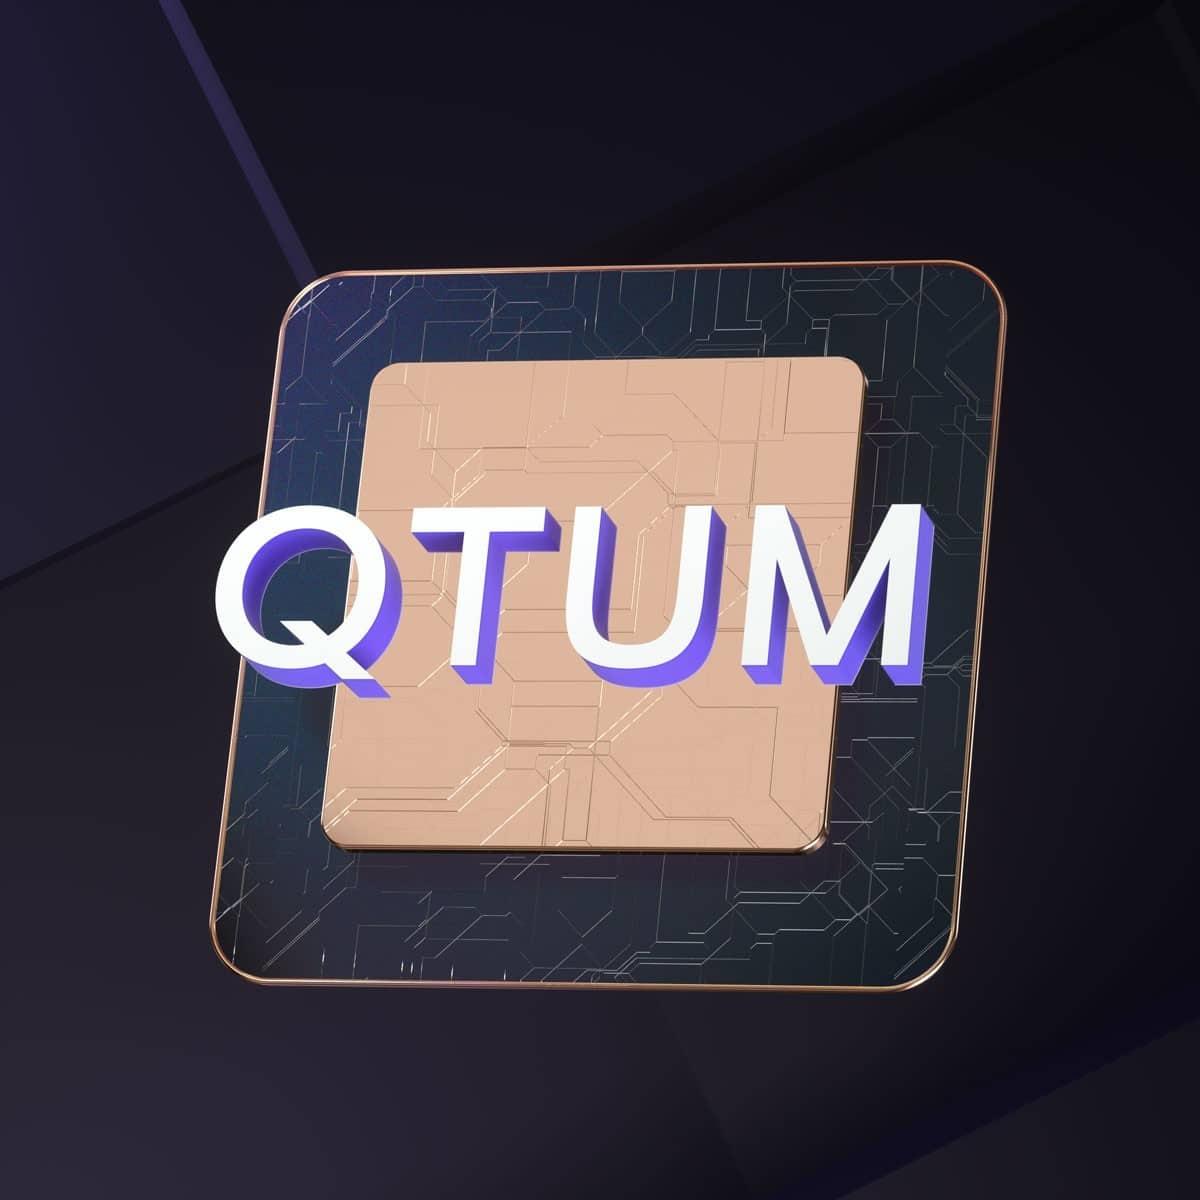 Biden Cites Quantum Computing as Integral Part of US's technological future